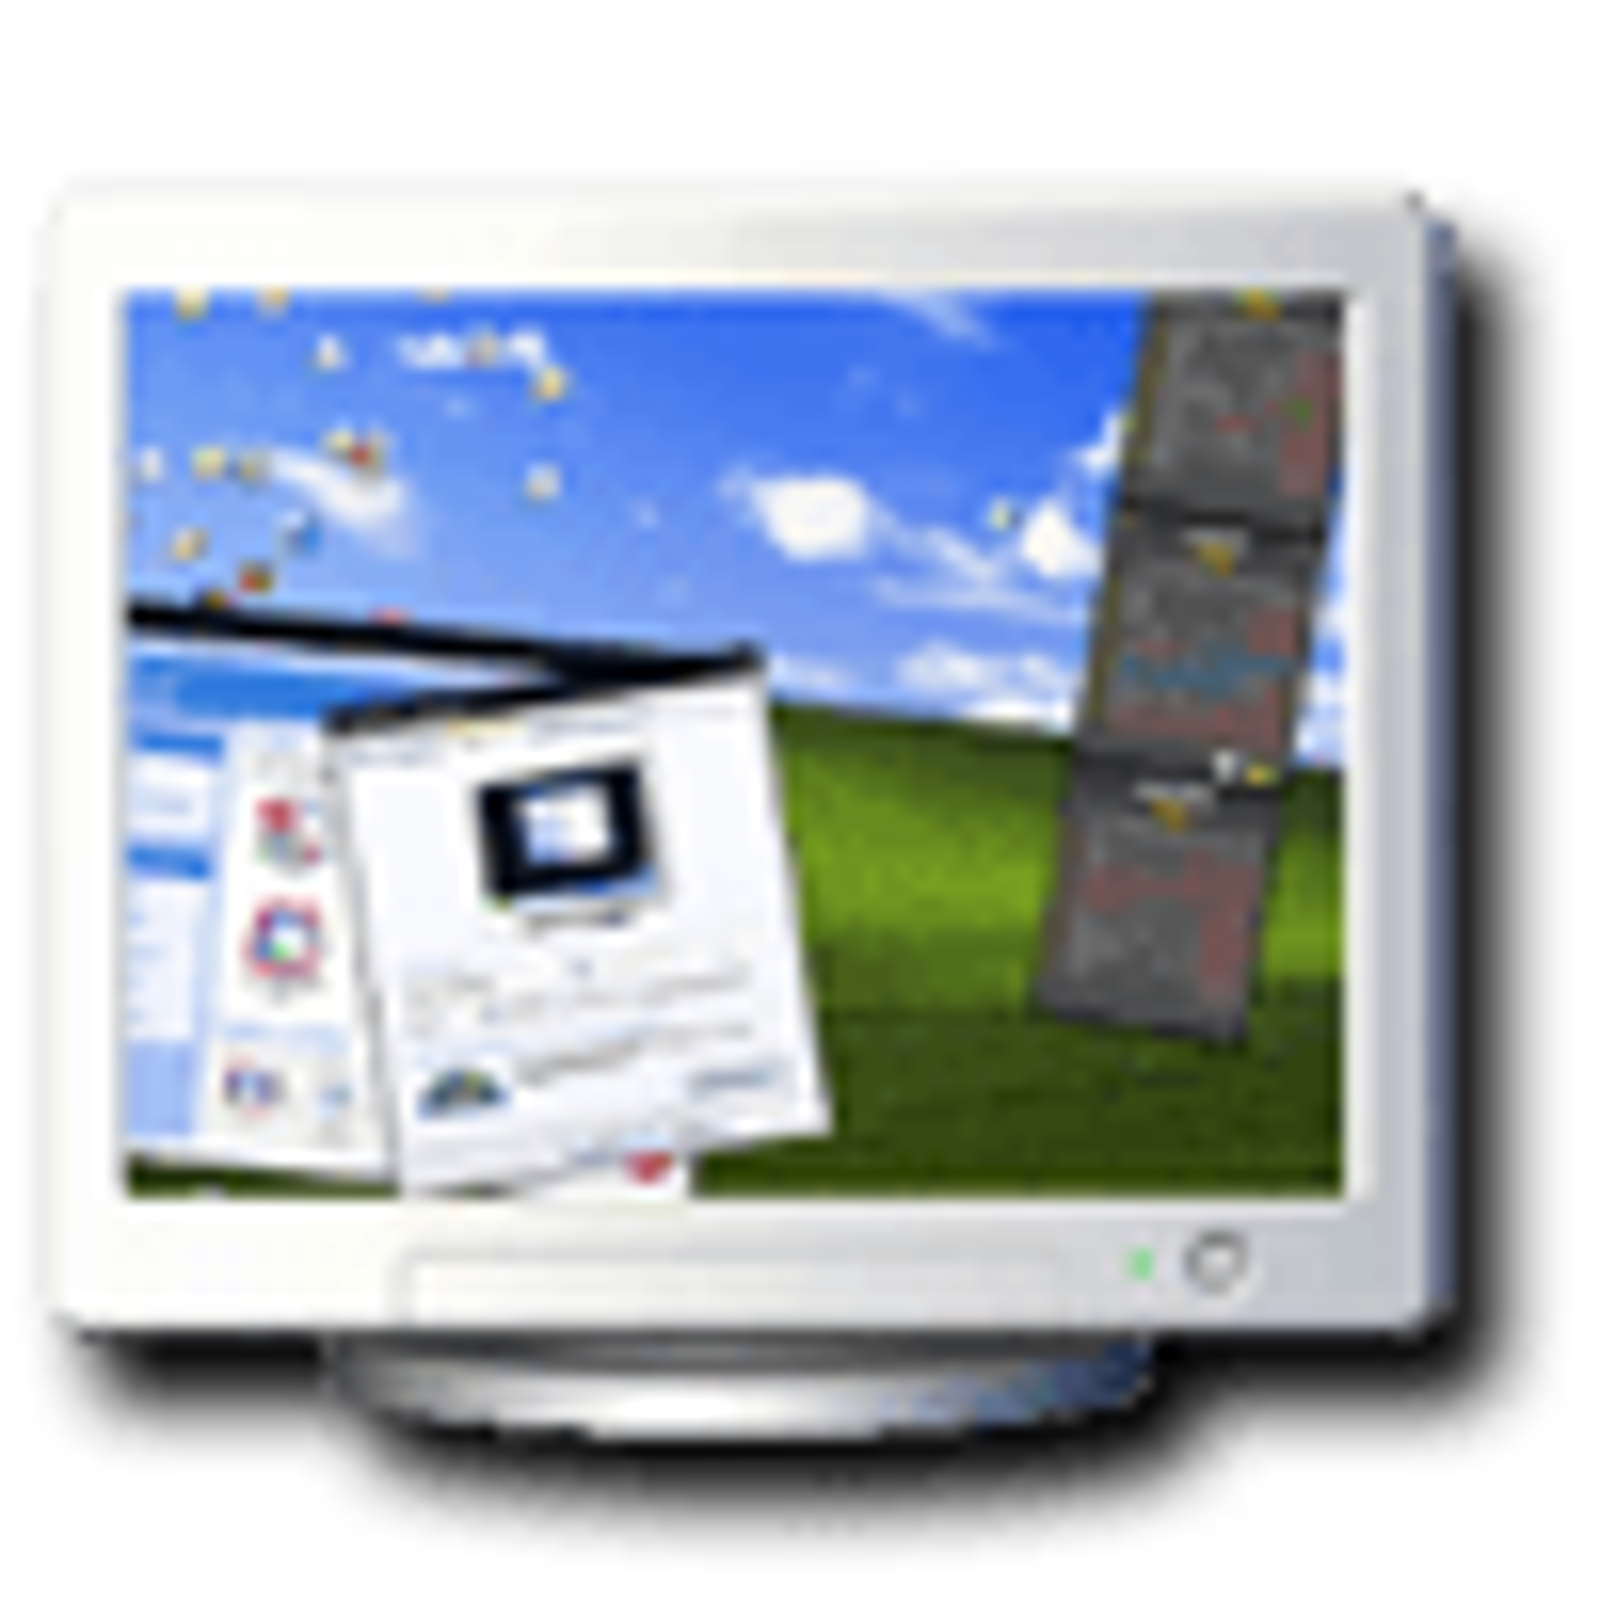 Kaze to Desktop